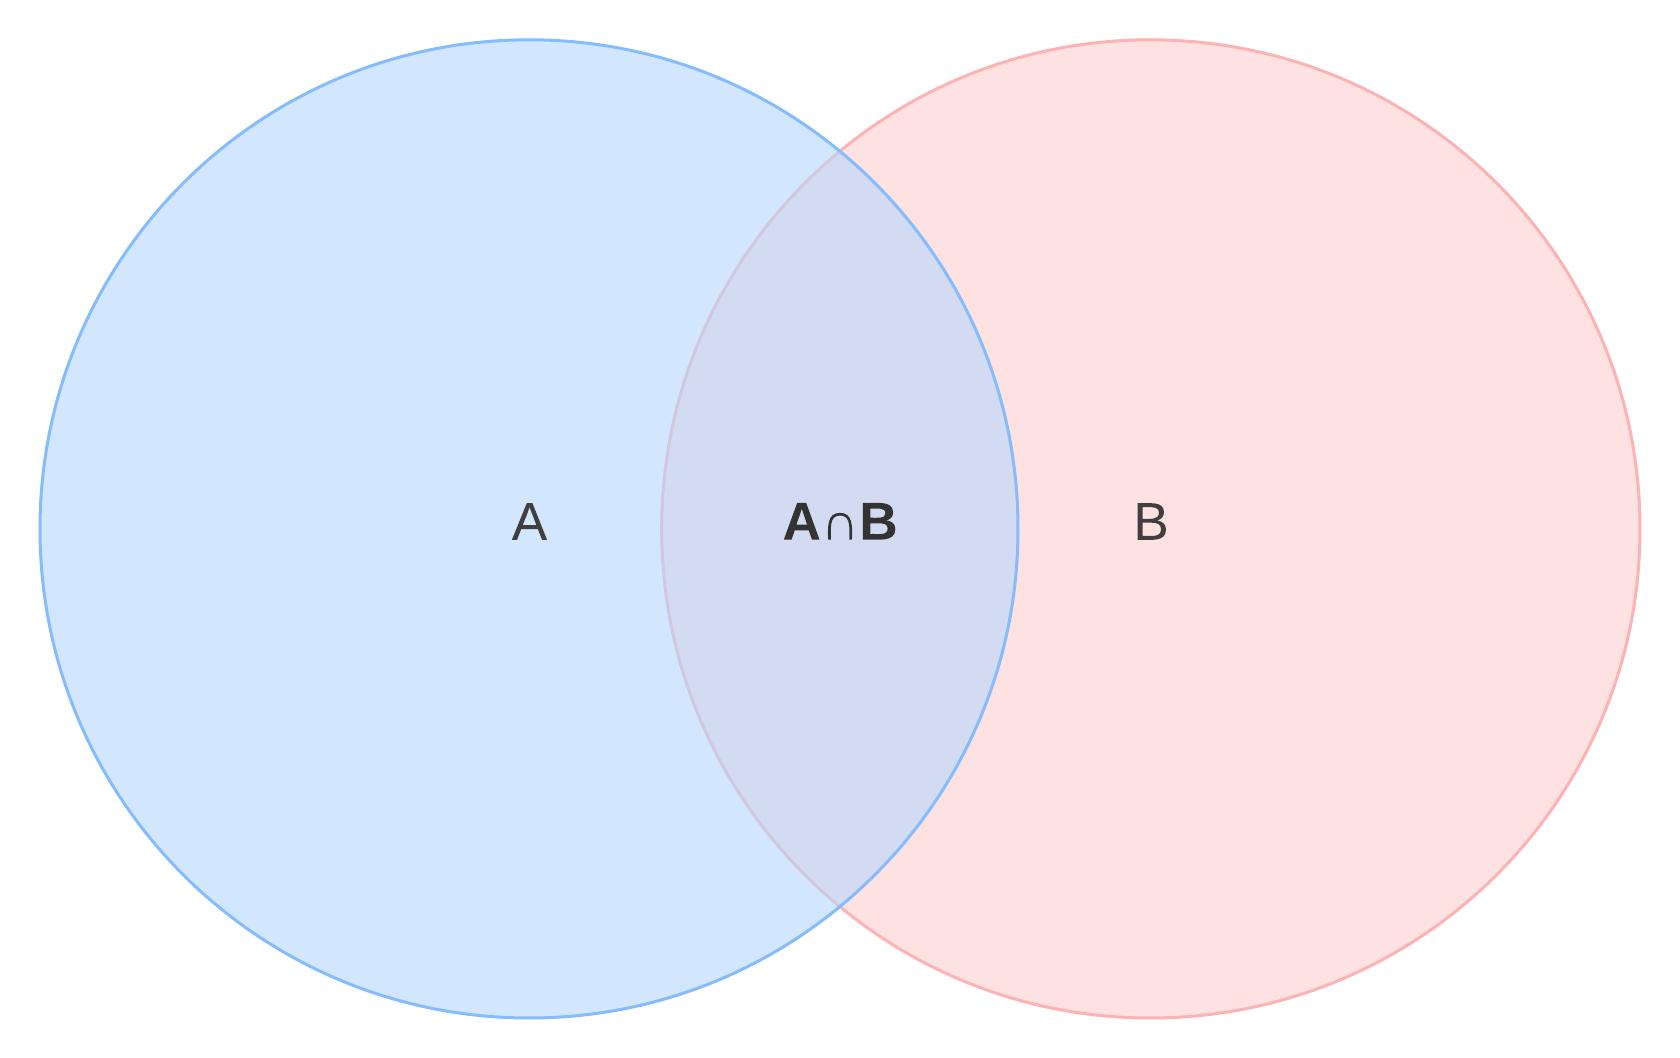 Venn Diagram Symbols And Notation